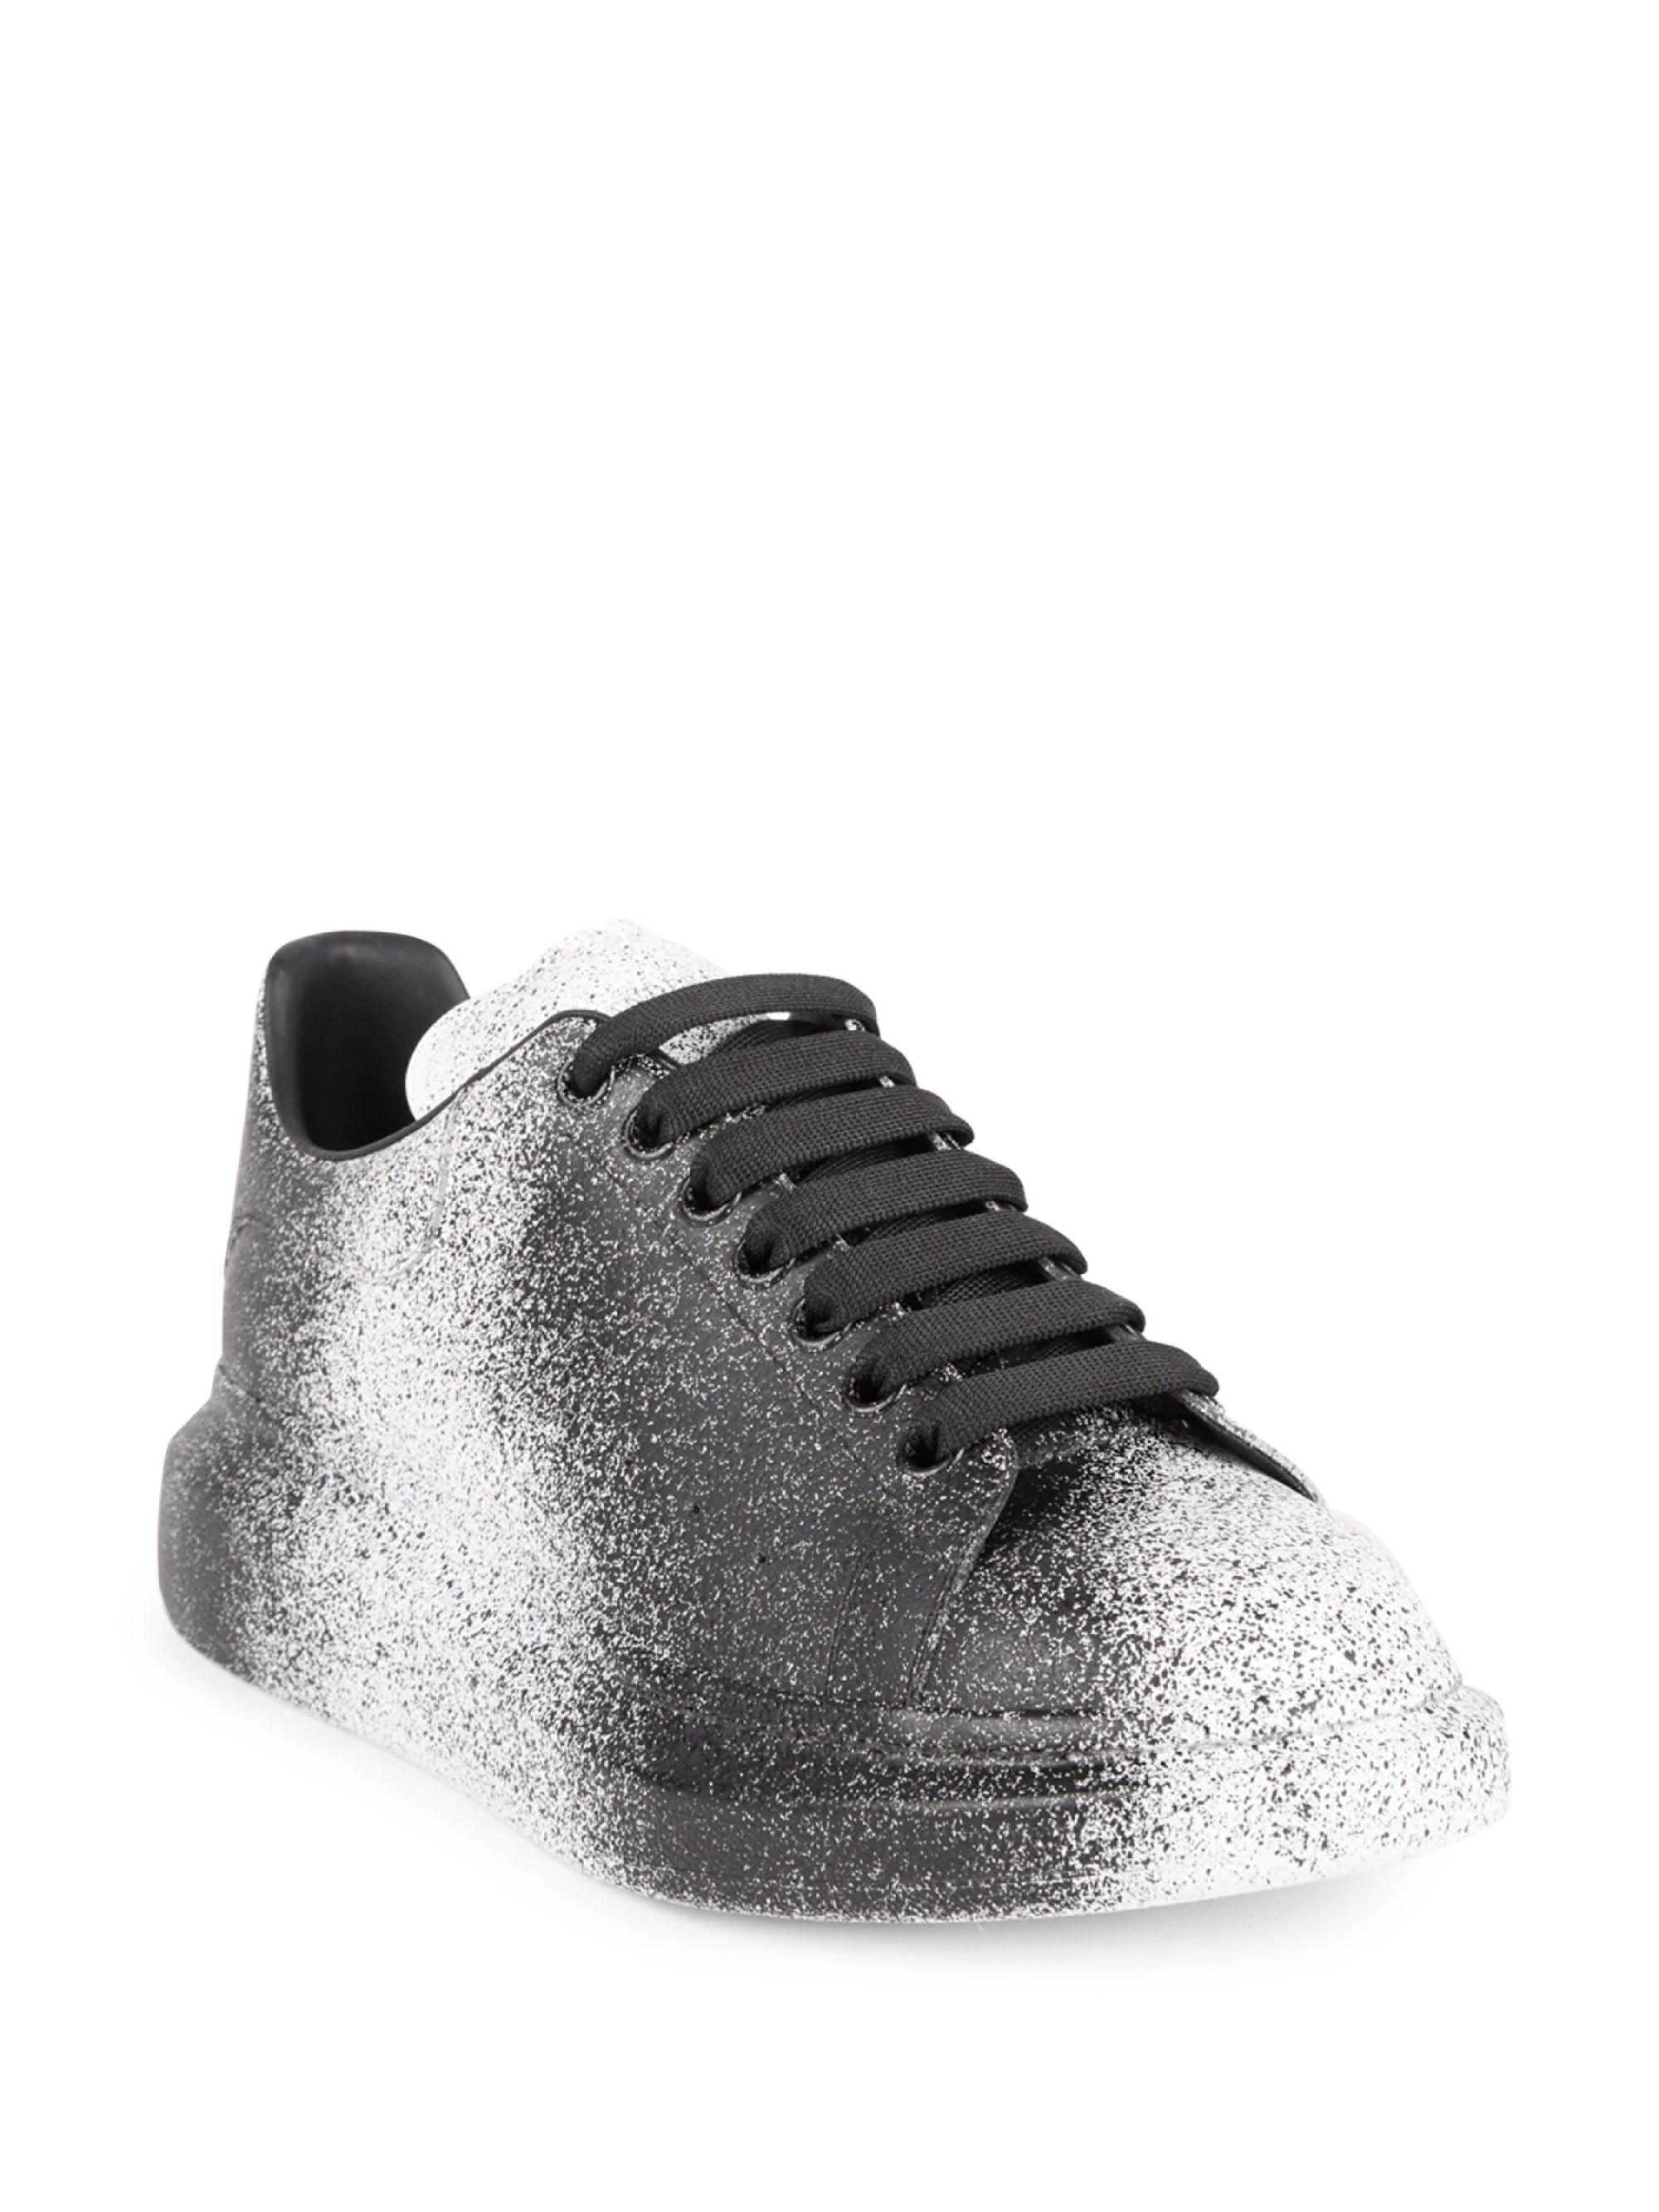 9f85a31bd alexander-mcqueen-black-white-Spray-Paint-Platform-Sneakers.jpeg